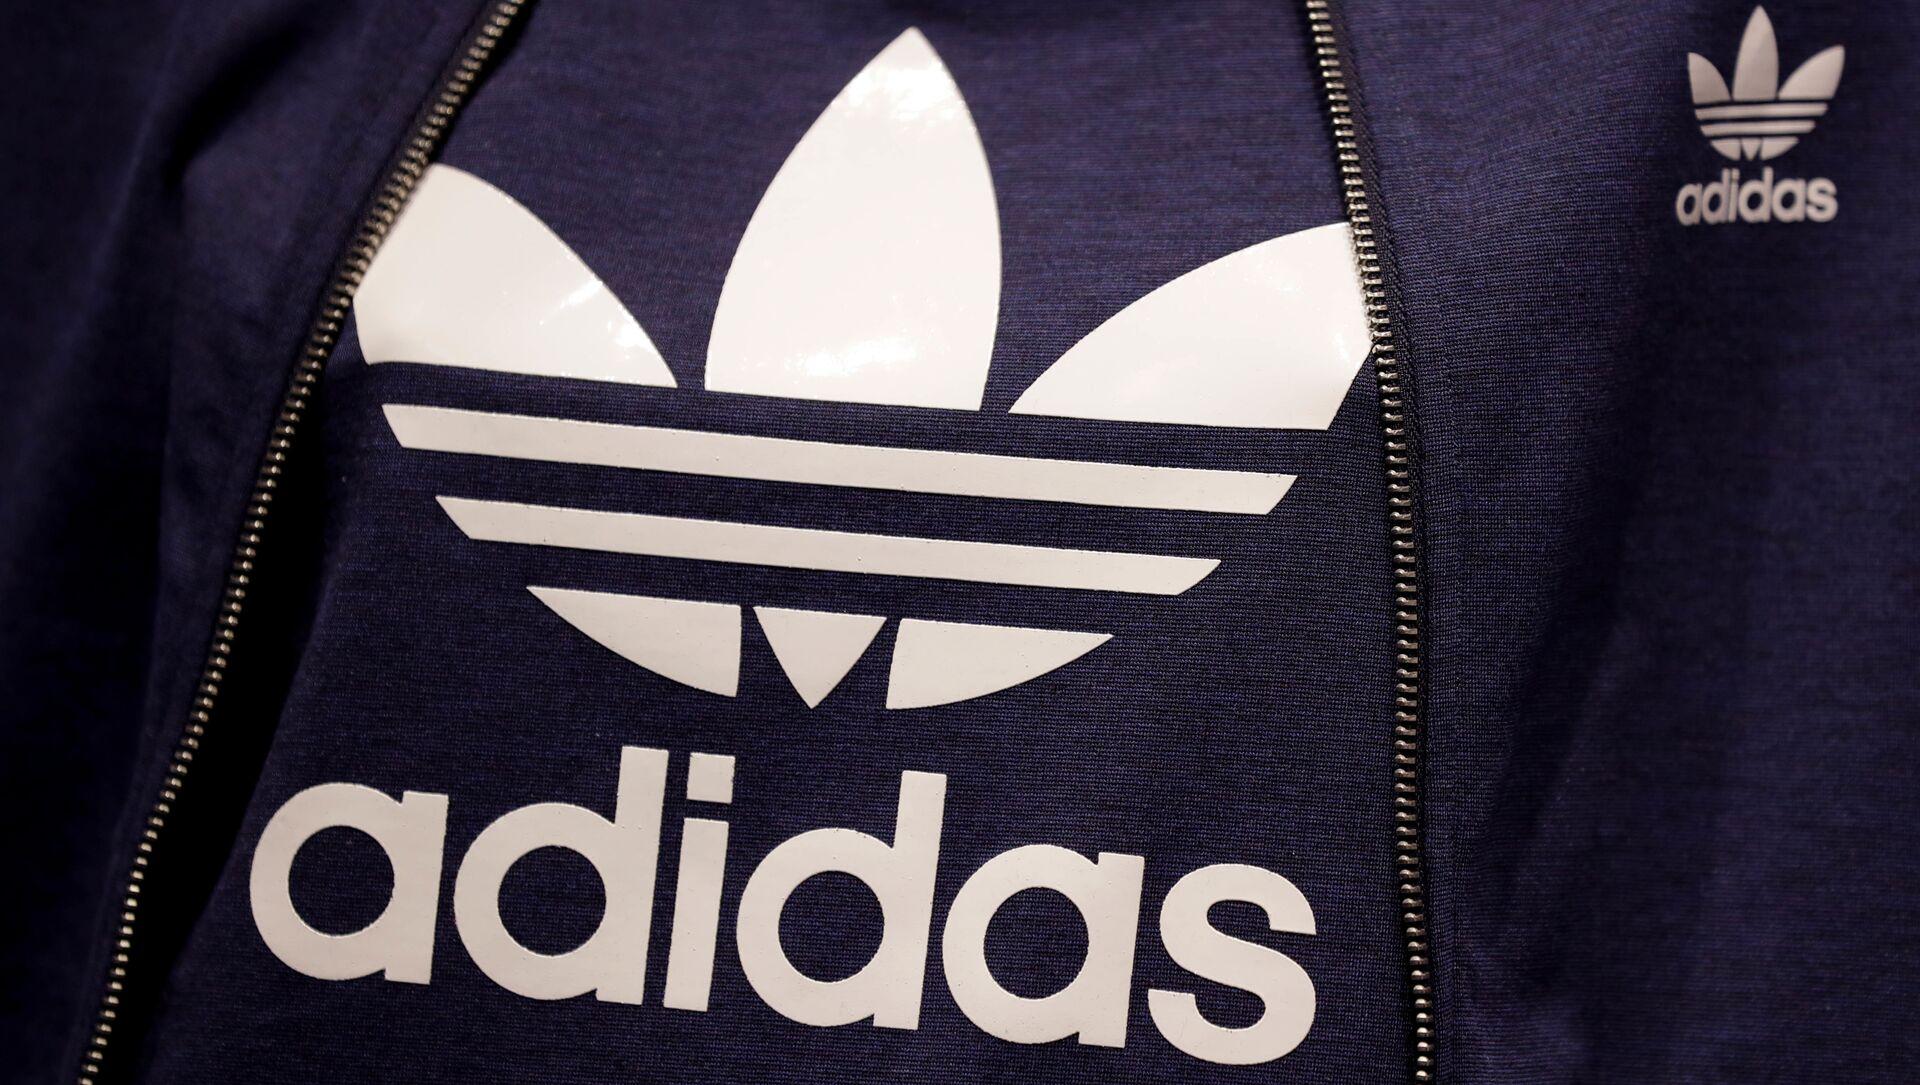 El logo de la marca Adidas - Sputnik Italia, 1920, 07.03.2021